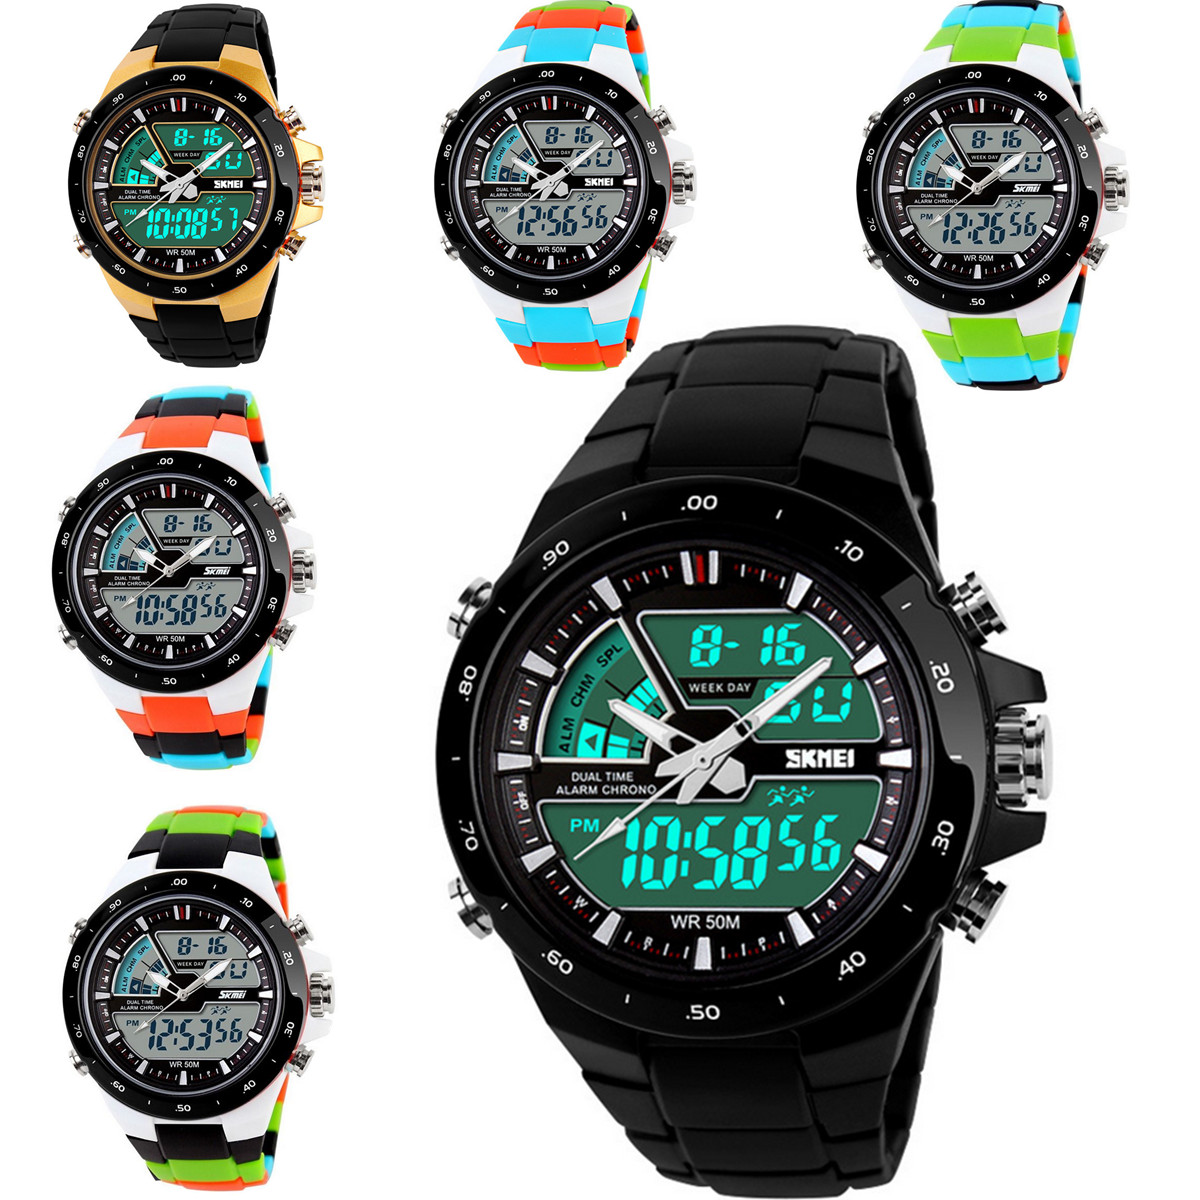 Обзор технических характеристик часов SKMEI AD1016 Analog Digital Multi-function Waterproof Men Sport Wrist